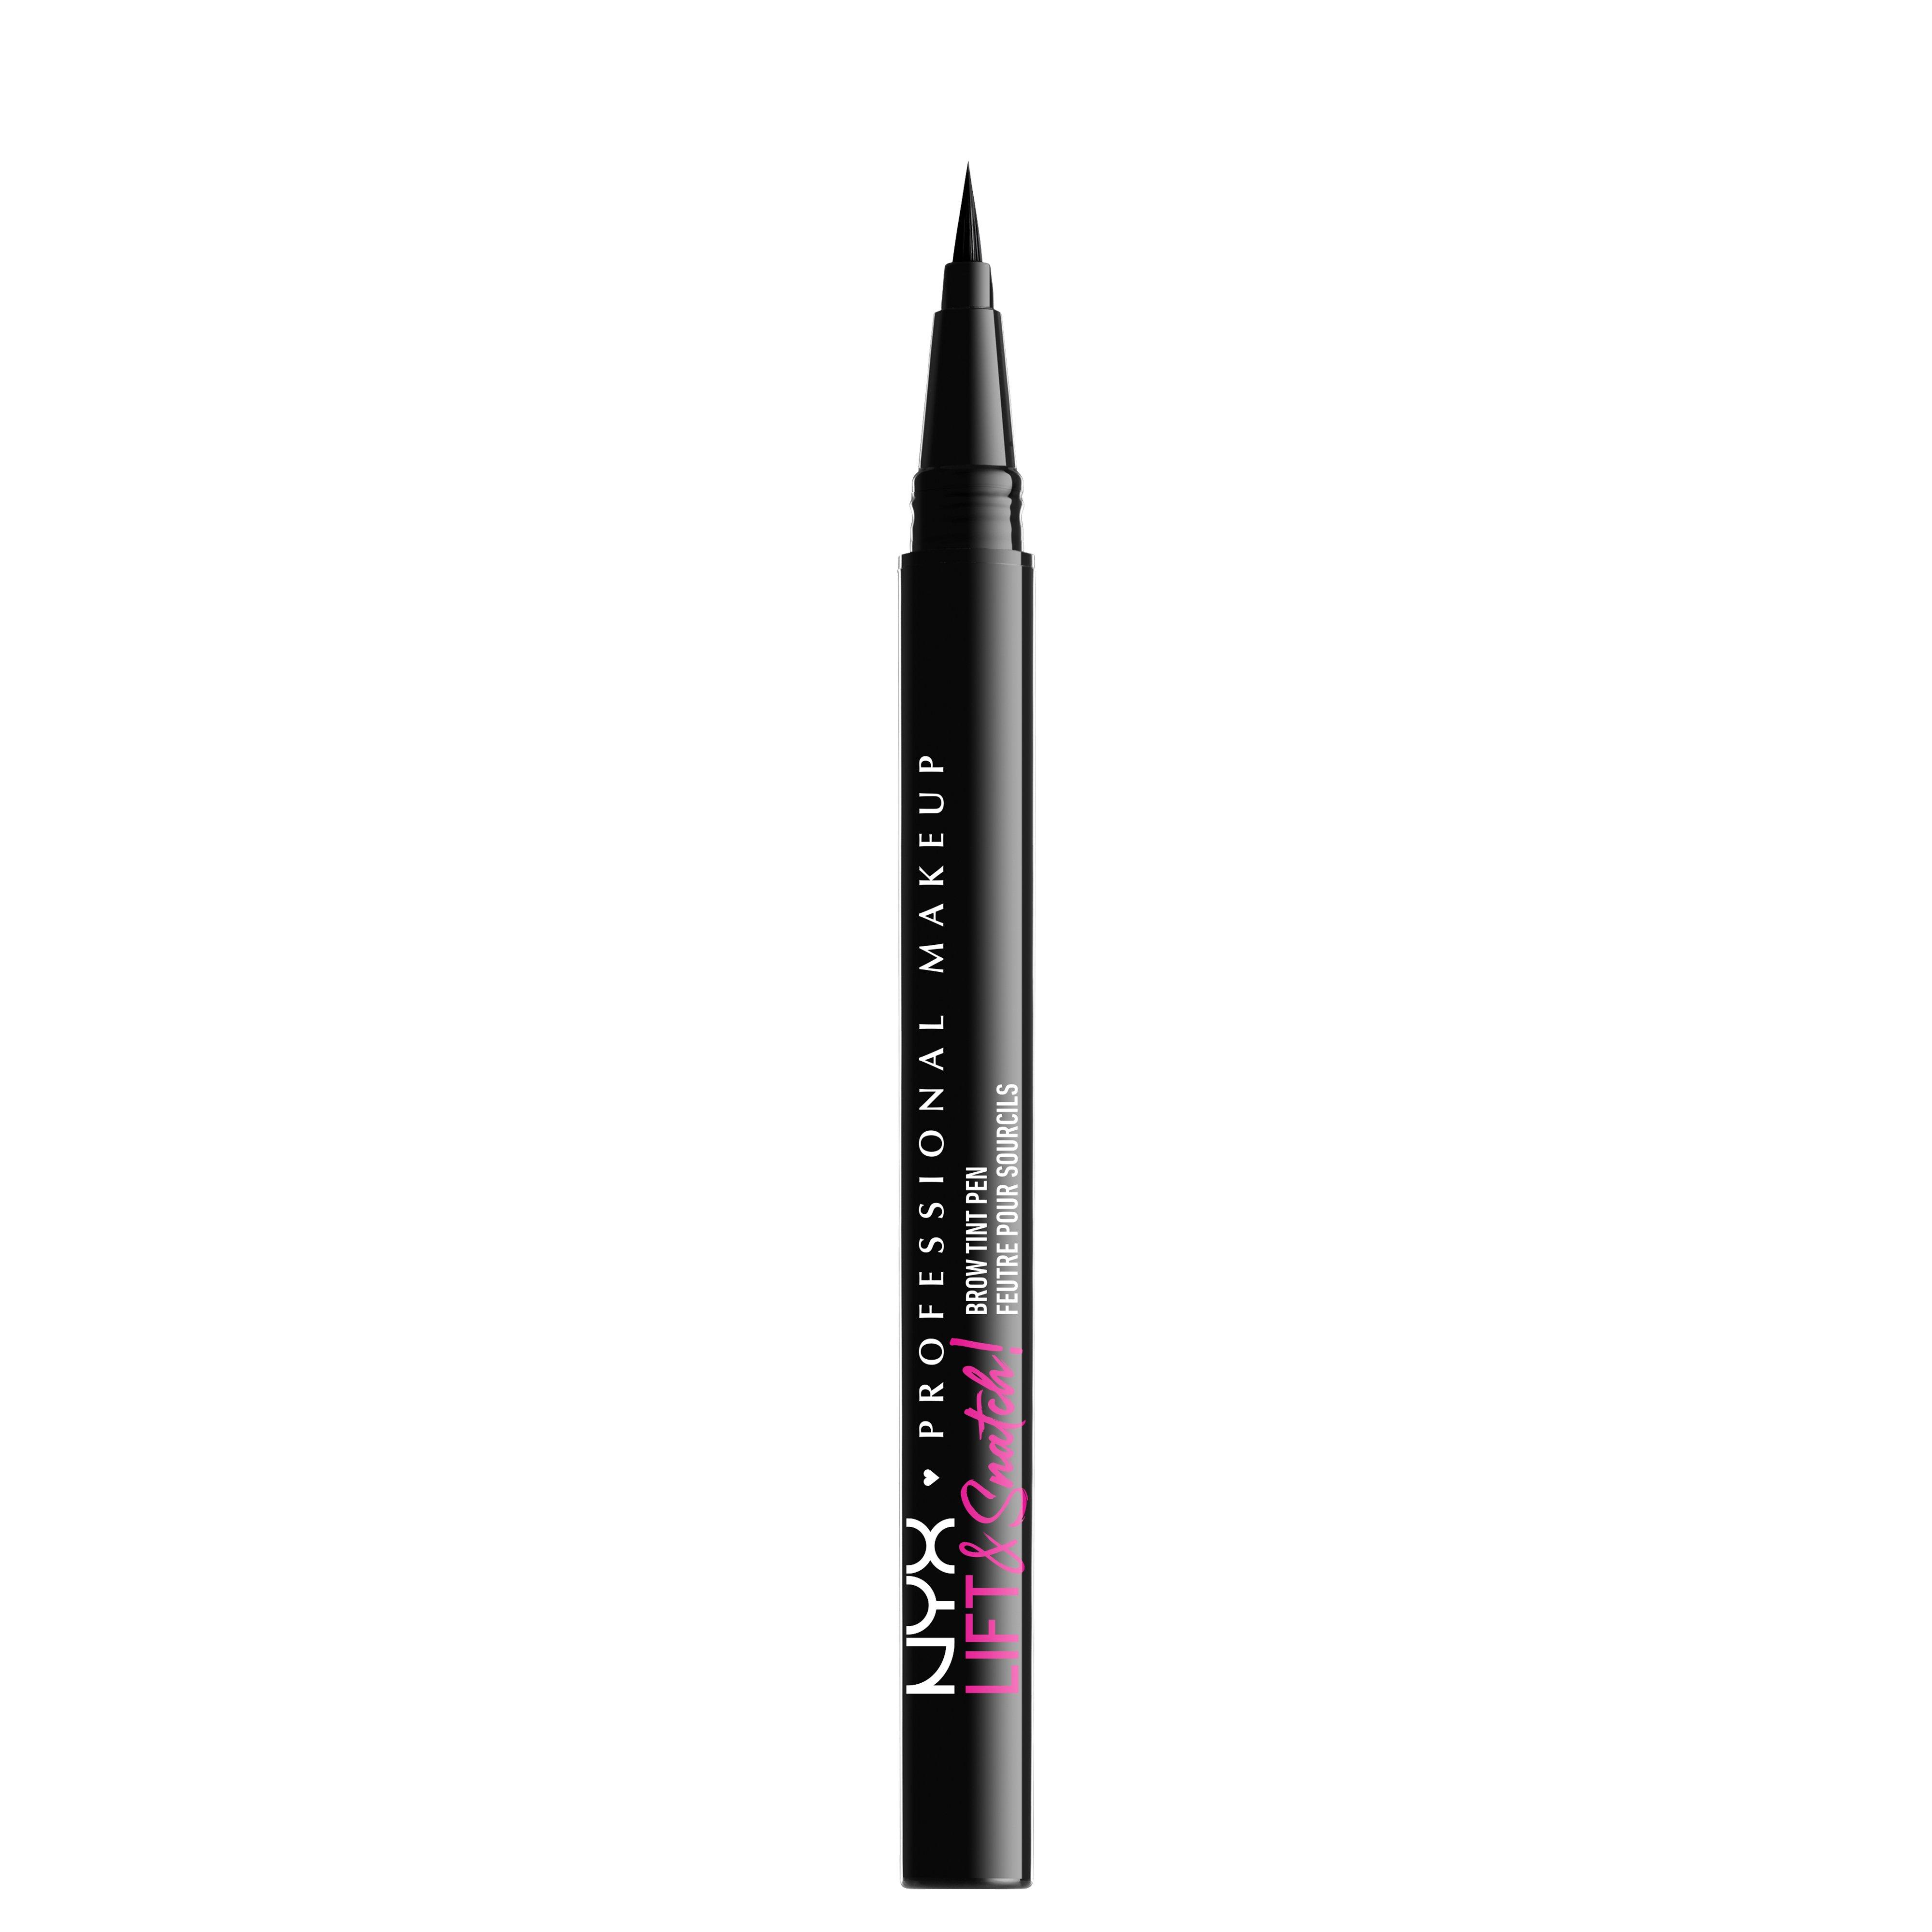 NYX Professional Makeup - Lift & Snatch! Brow Tint Pen - Black